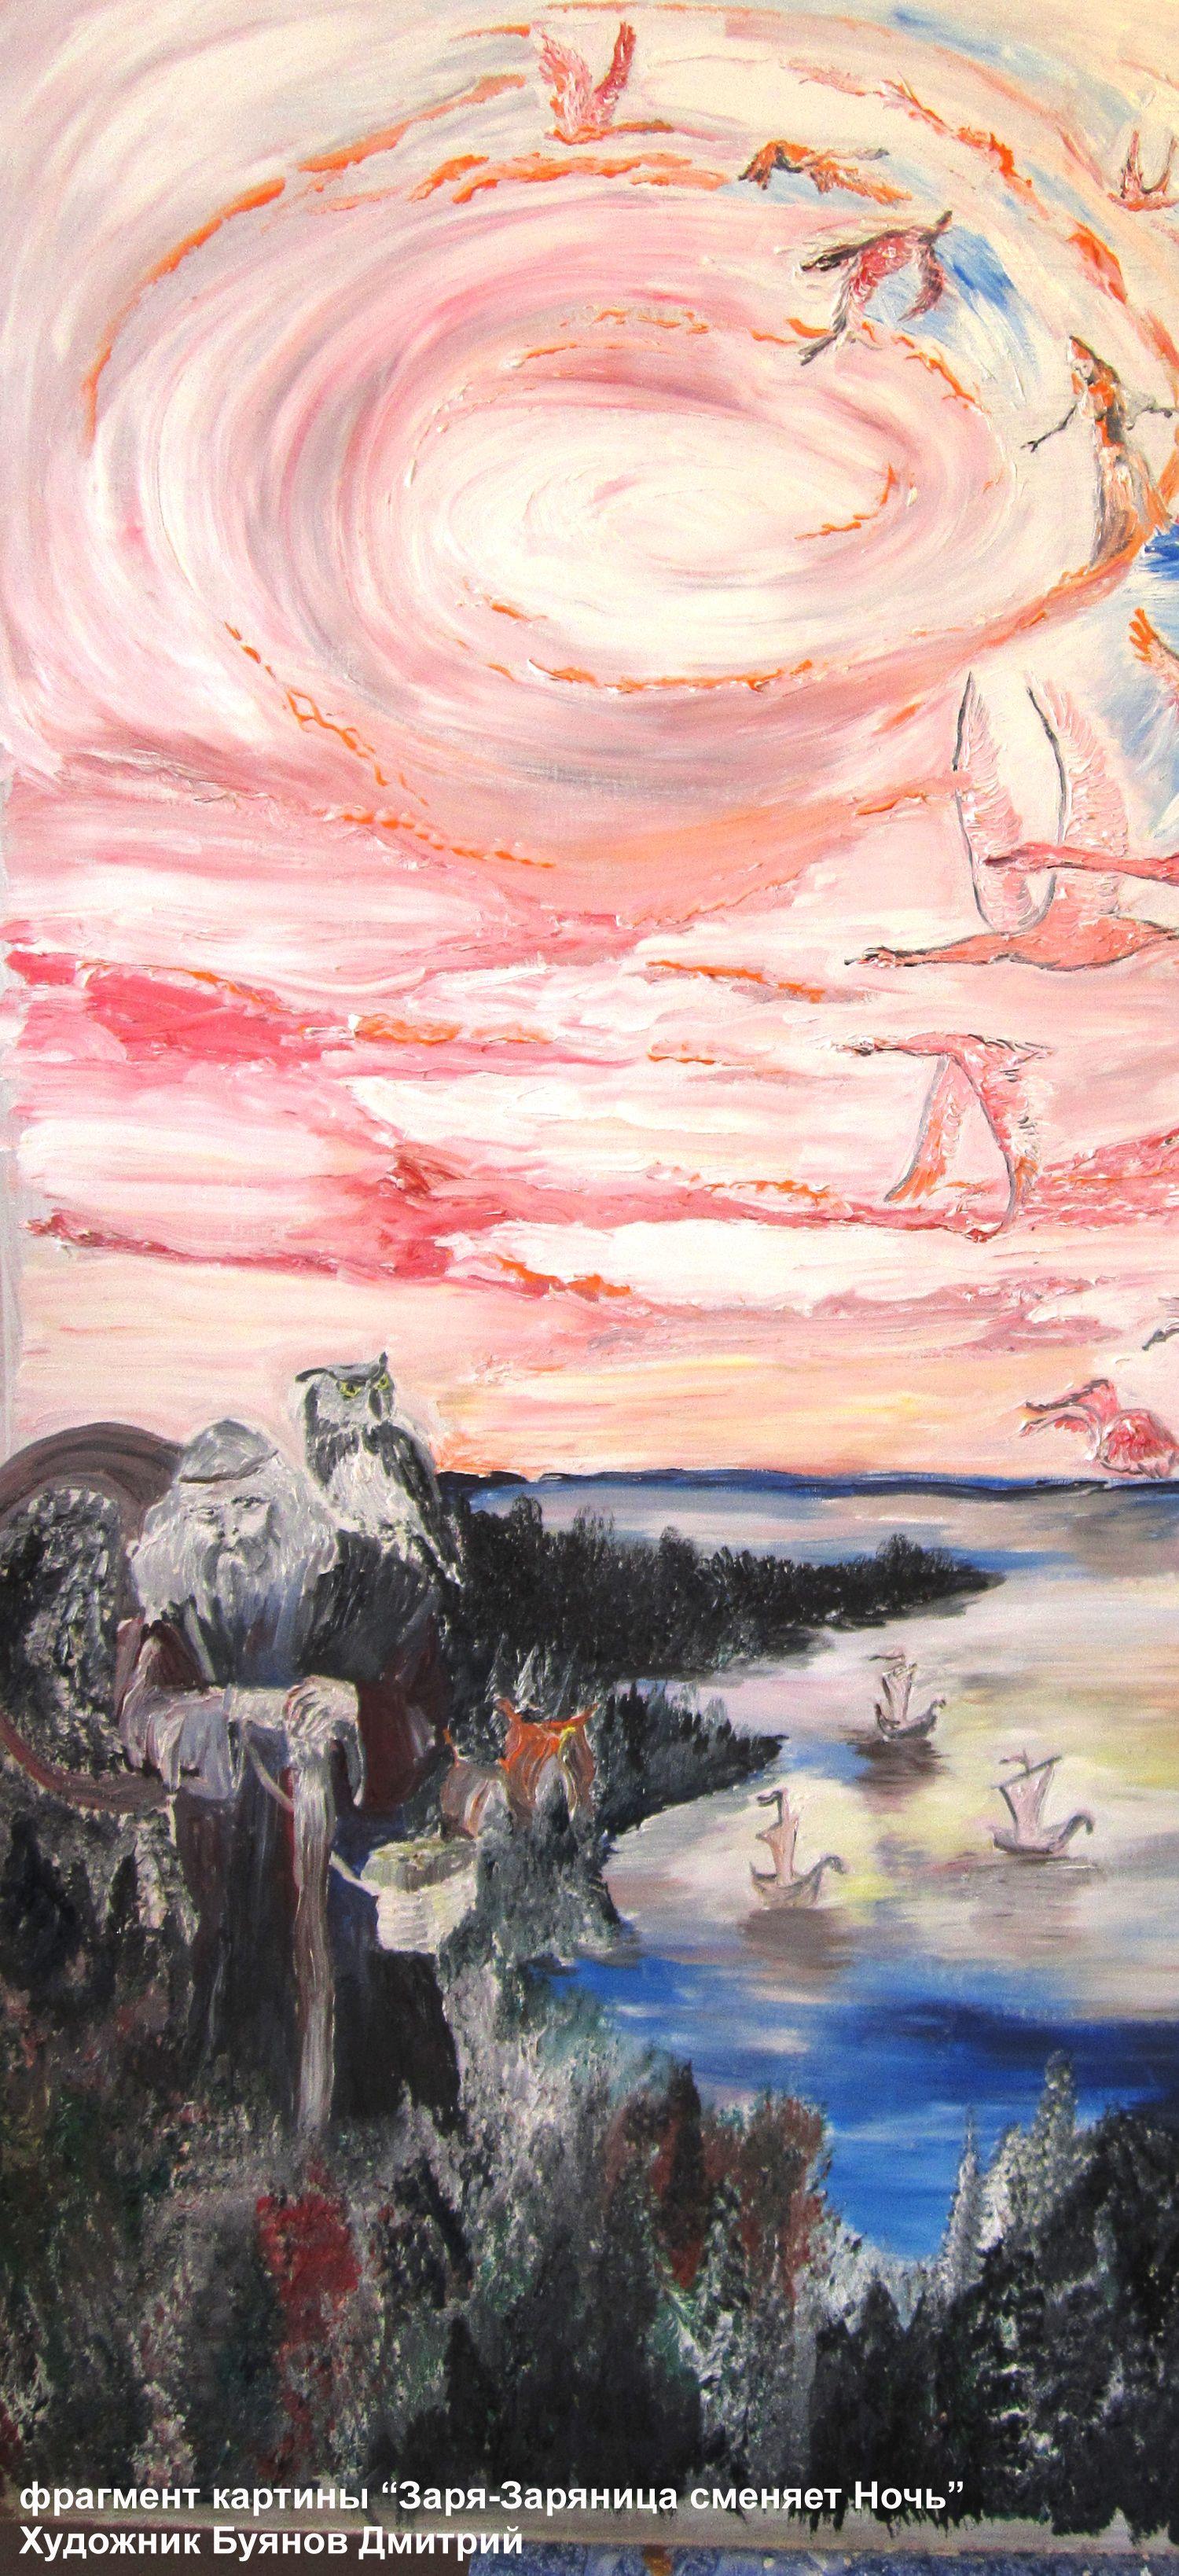 "Дмитрий Юрьевич Буянов. A fragment of the painting ""dawn-Zagranica follows Night"" the Artist Dmitry Buyanov"